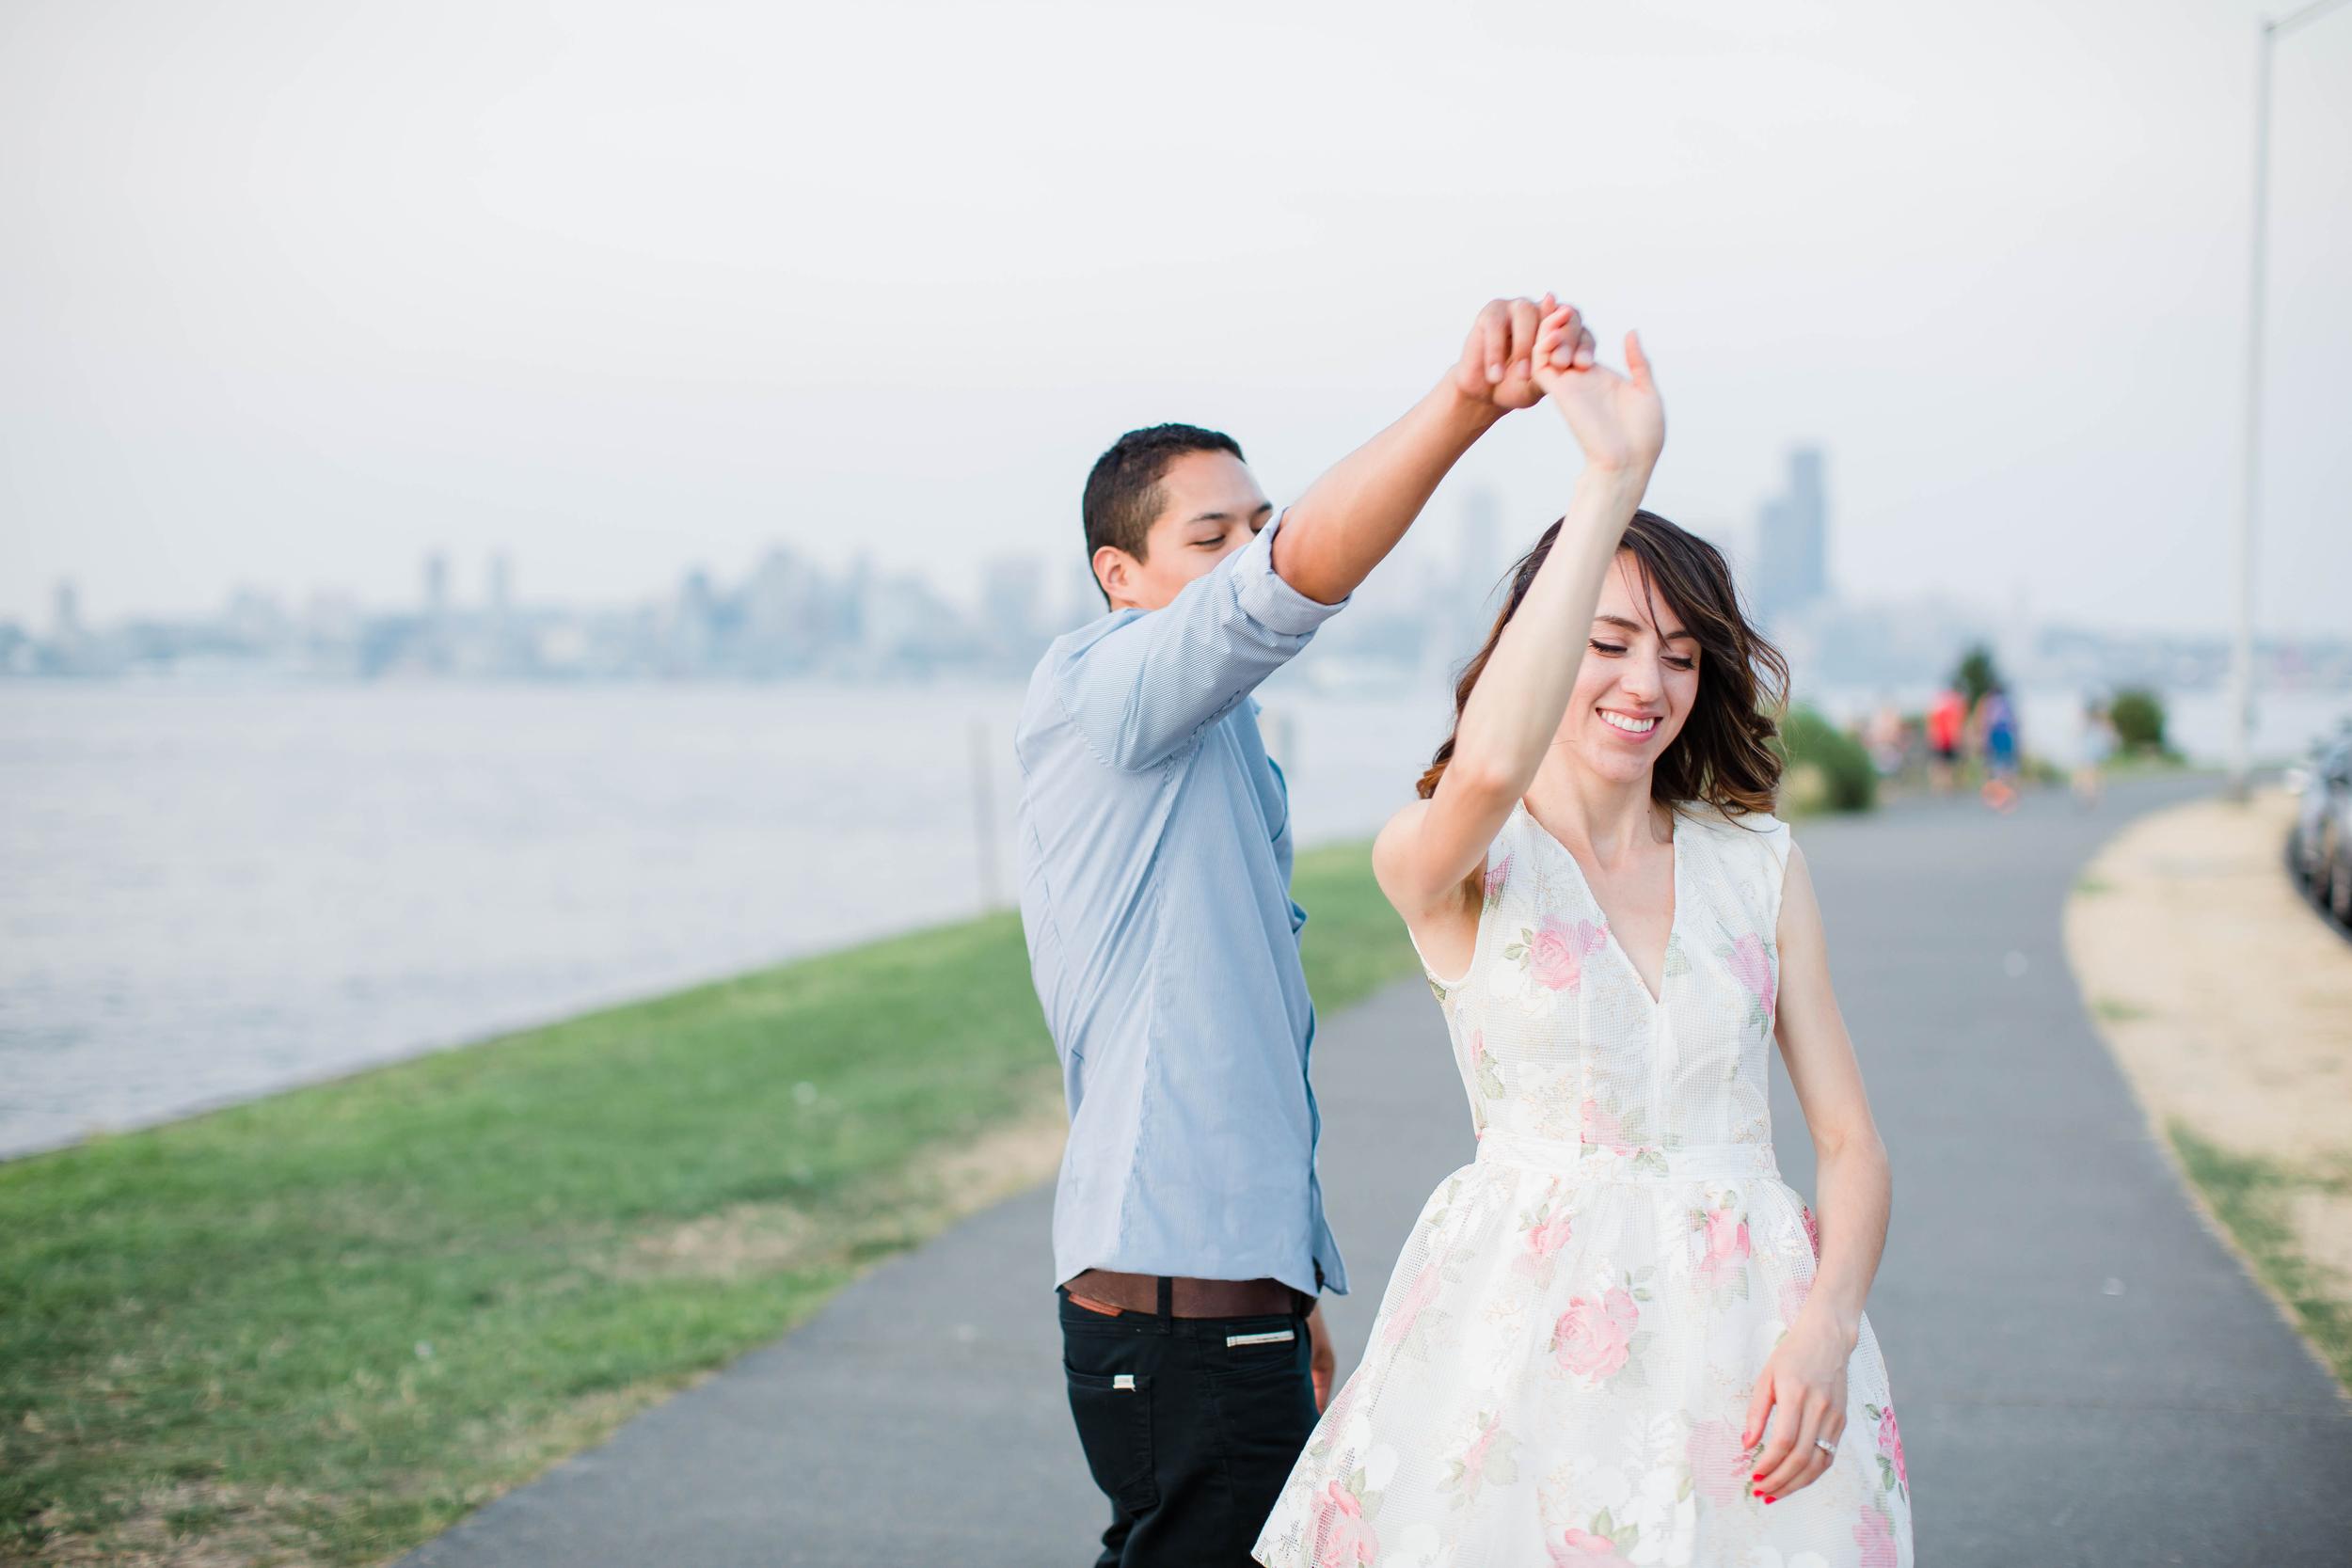 Cruz+Robert ©2015AdinaPrestonPhotography-Seattle+Photographer+Engagement-Weddings-48.jpg